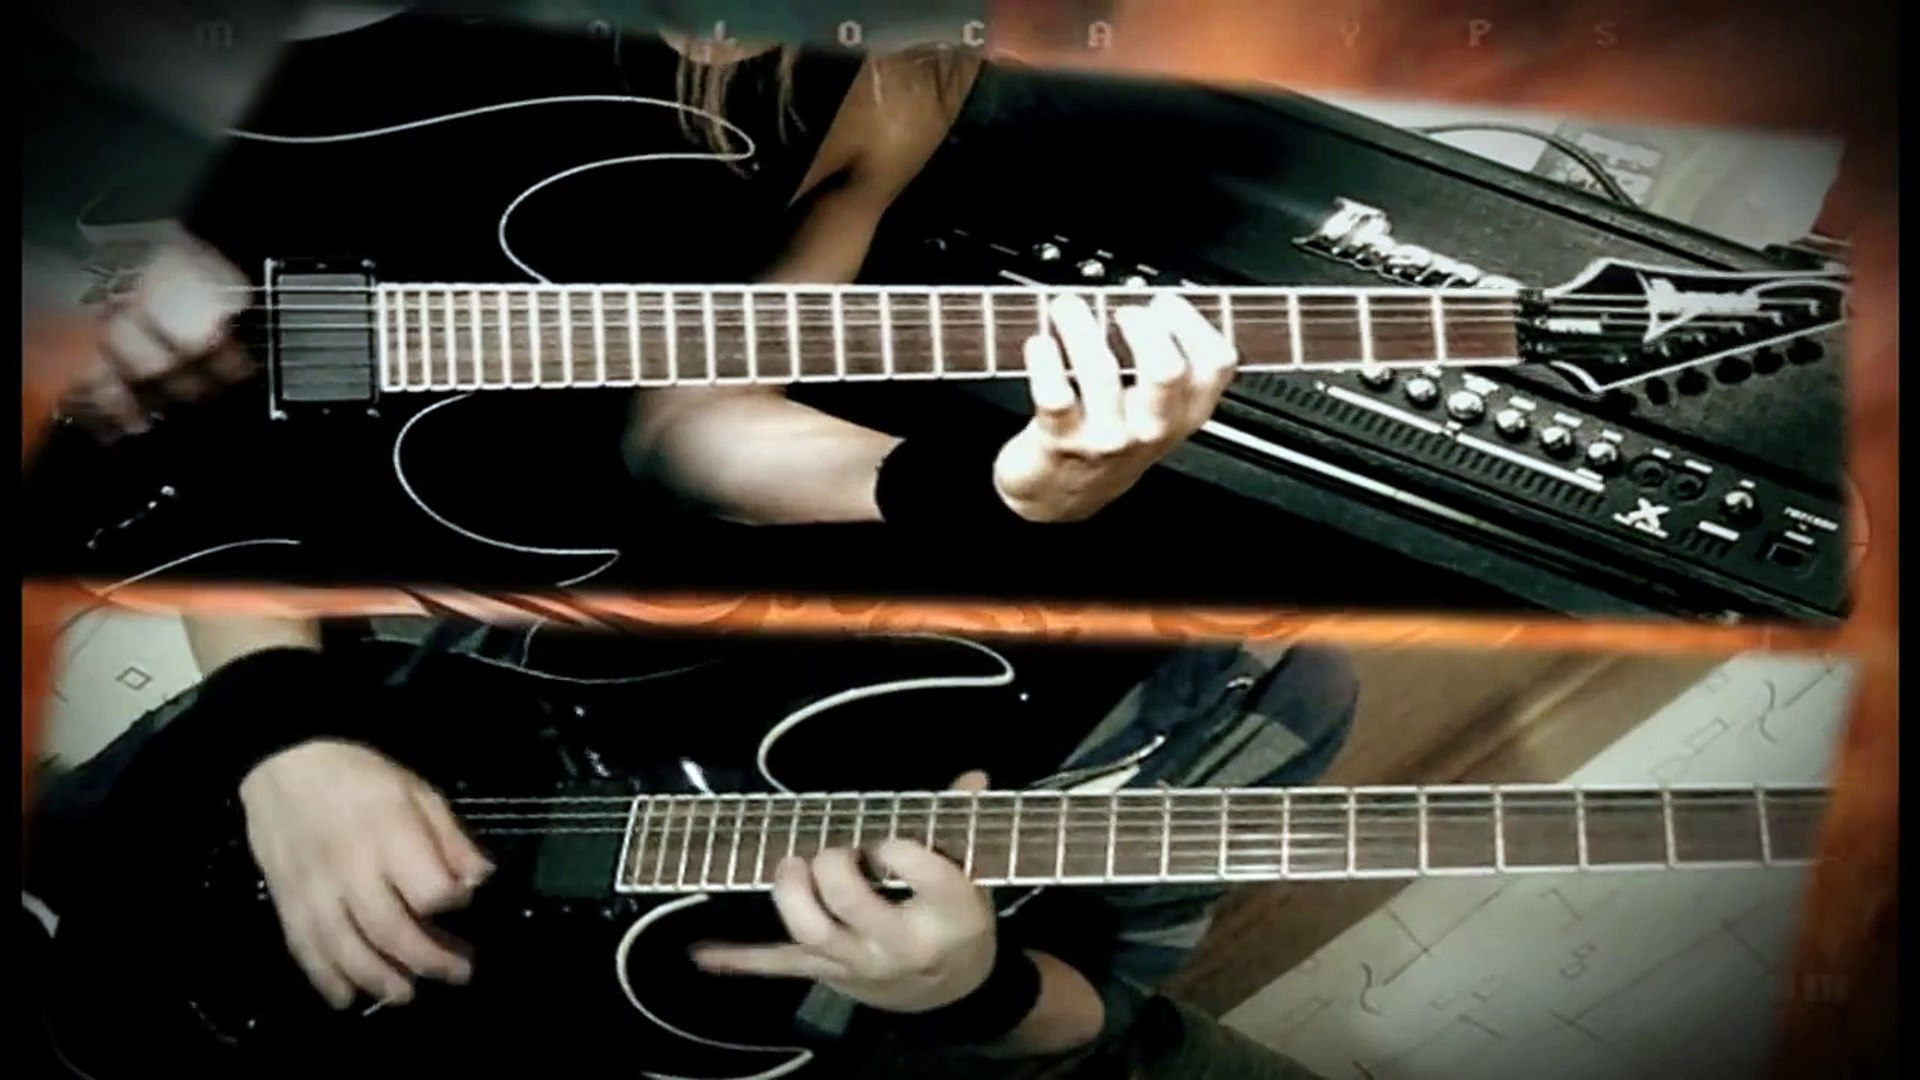 Dethklok Thunderhorse guitar cover (both parts)